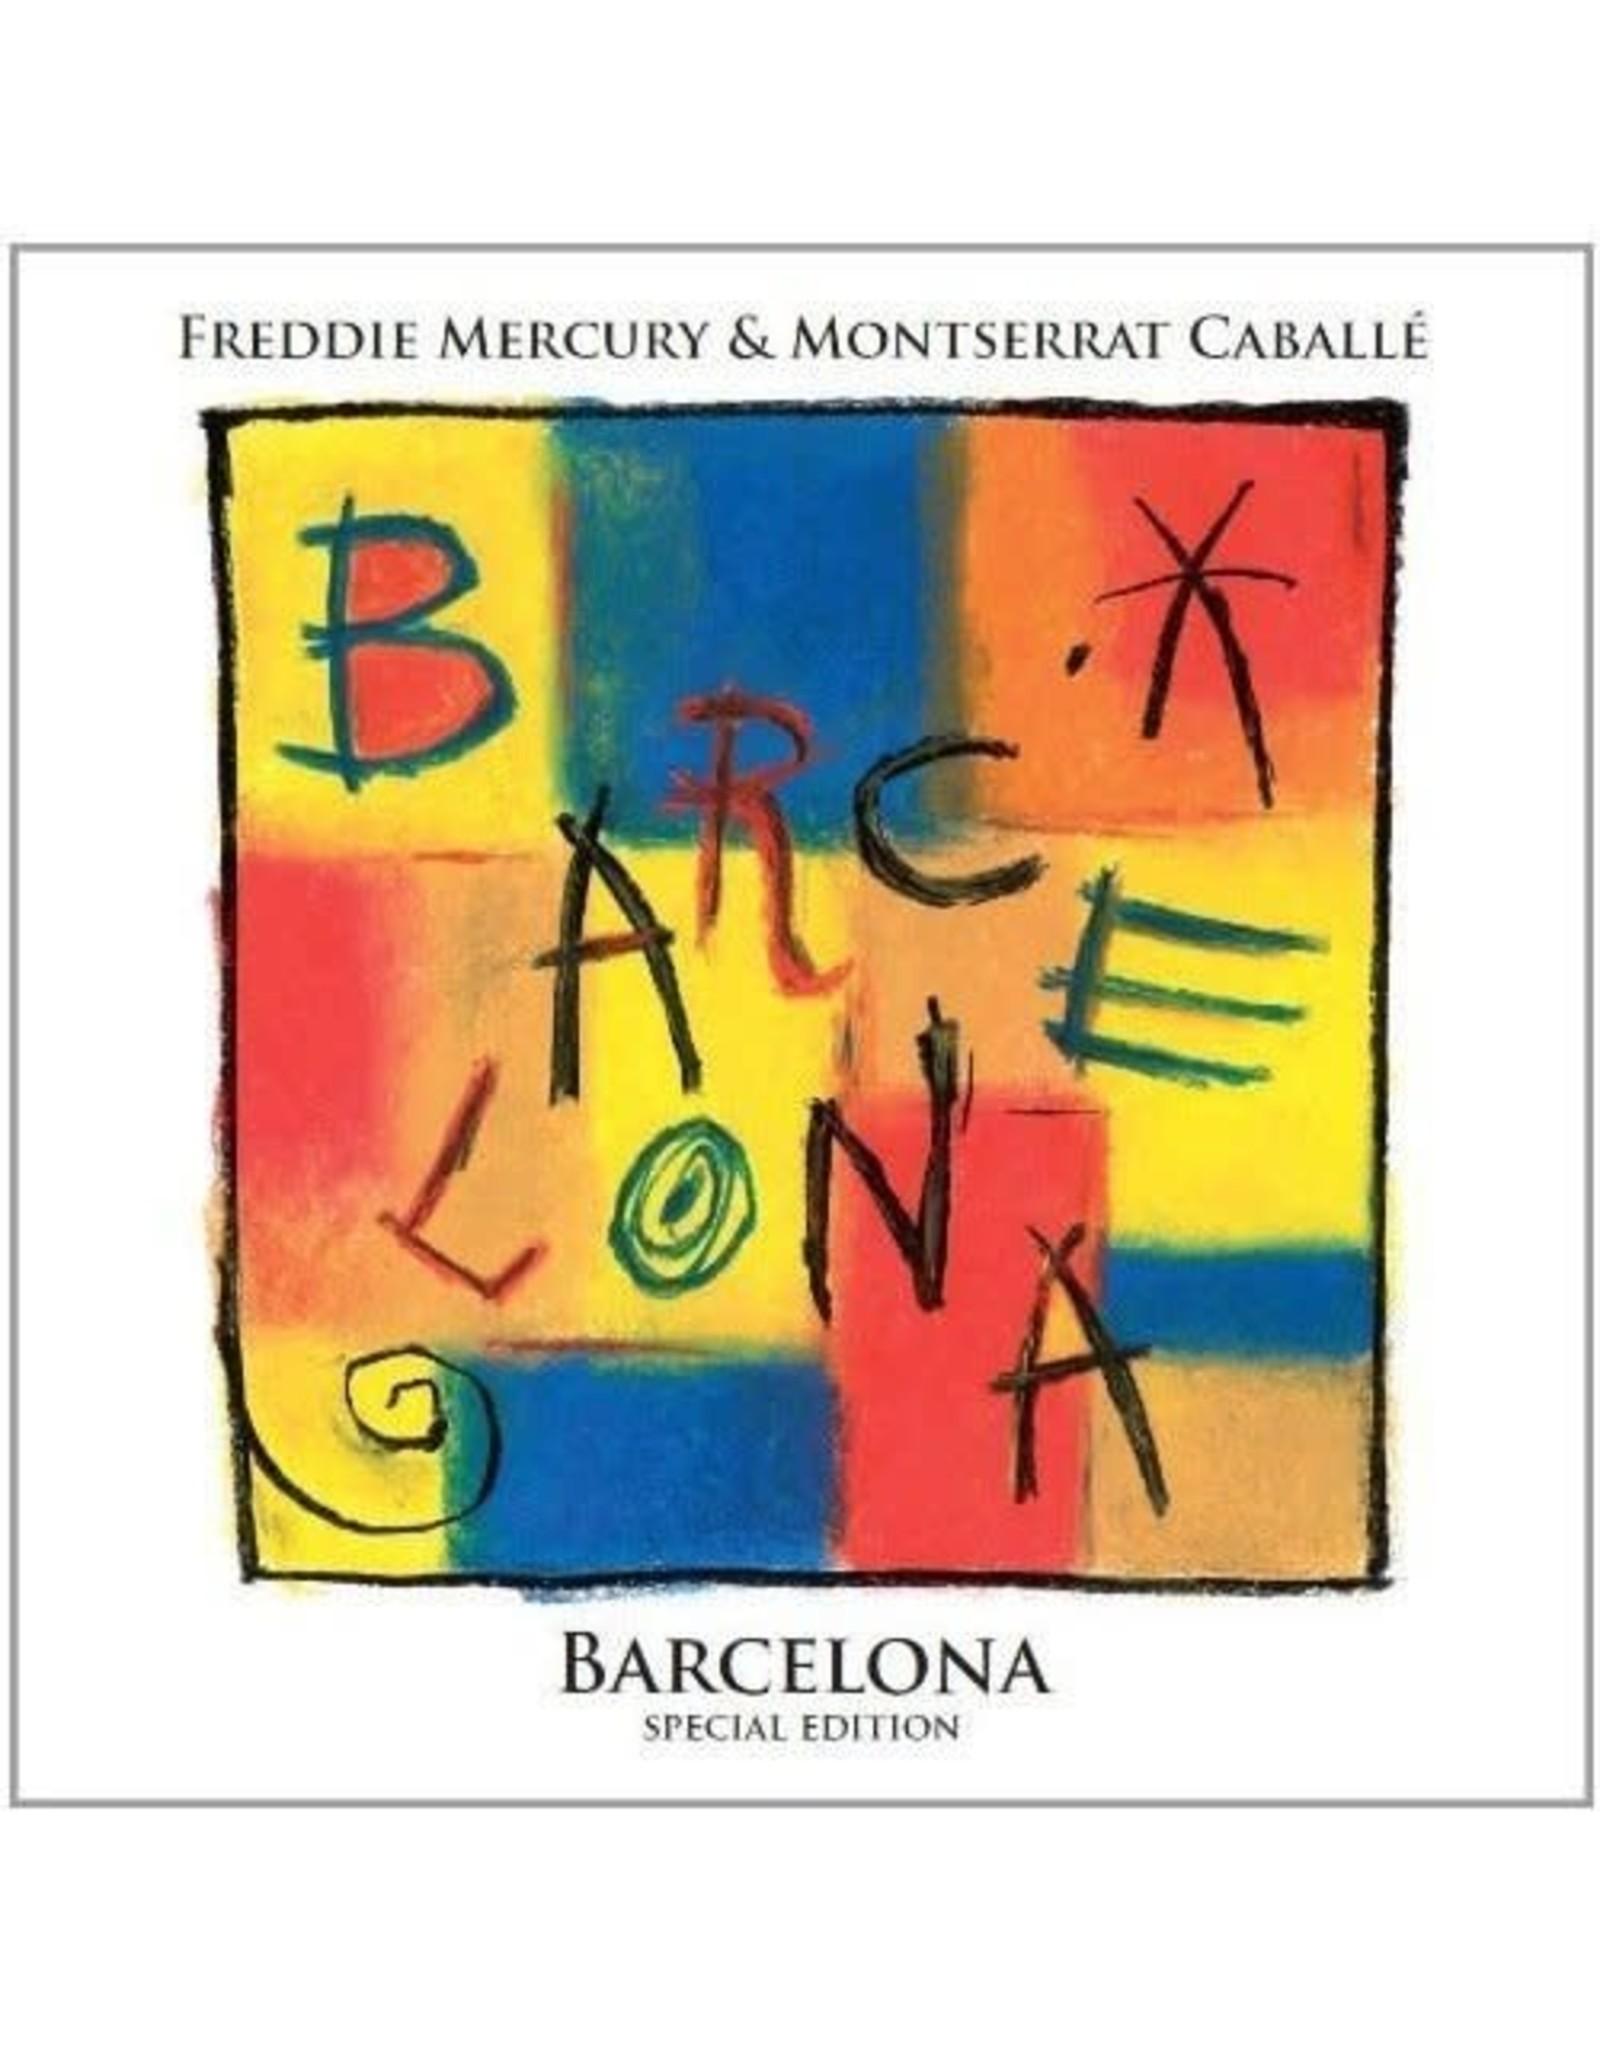 Freddie Mercury - Barcelona (Special Edition)